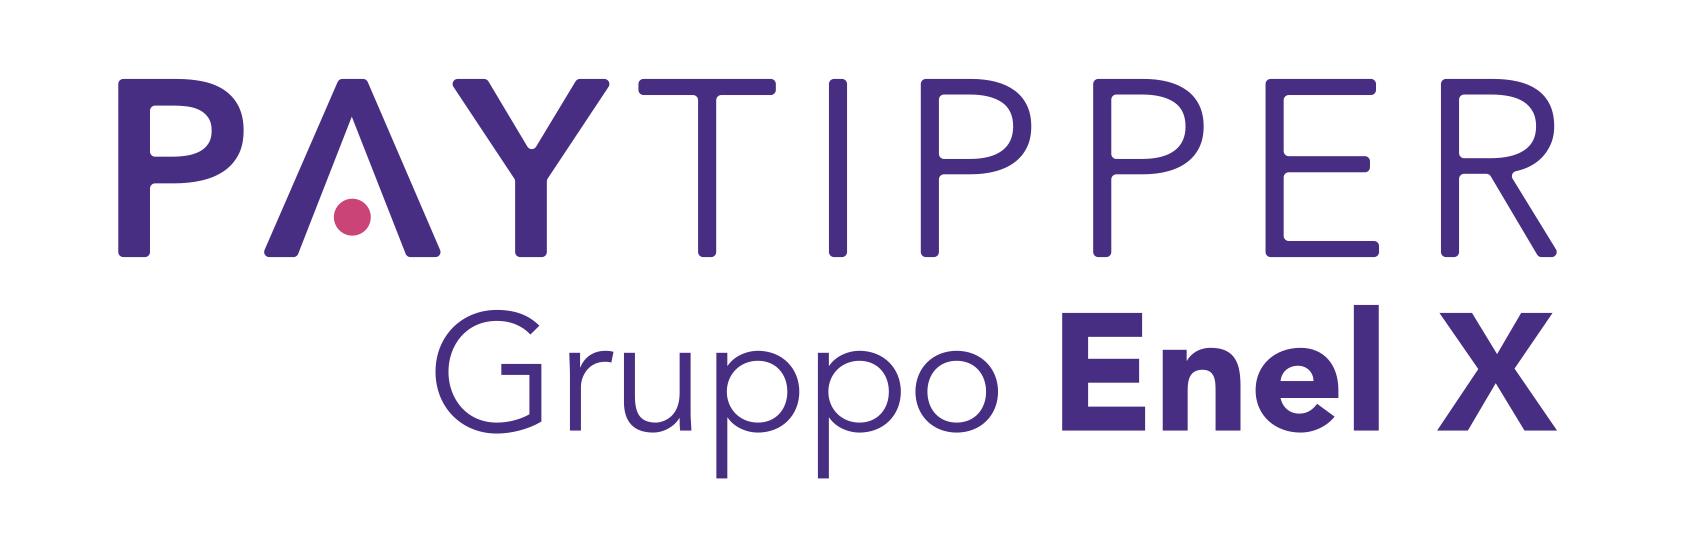 Paytipper EnelX